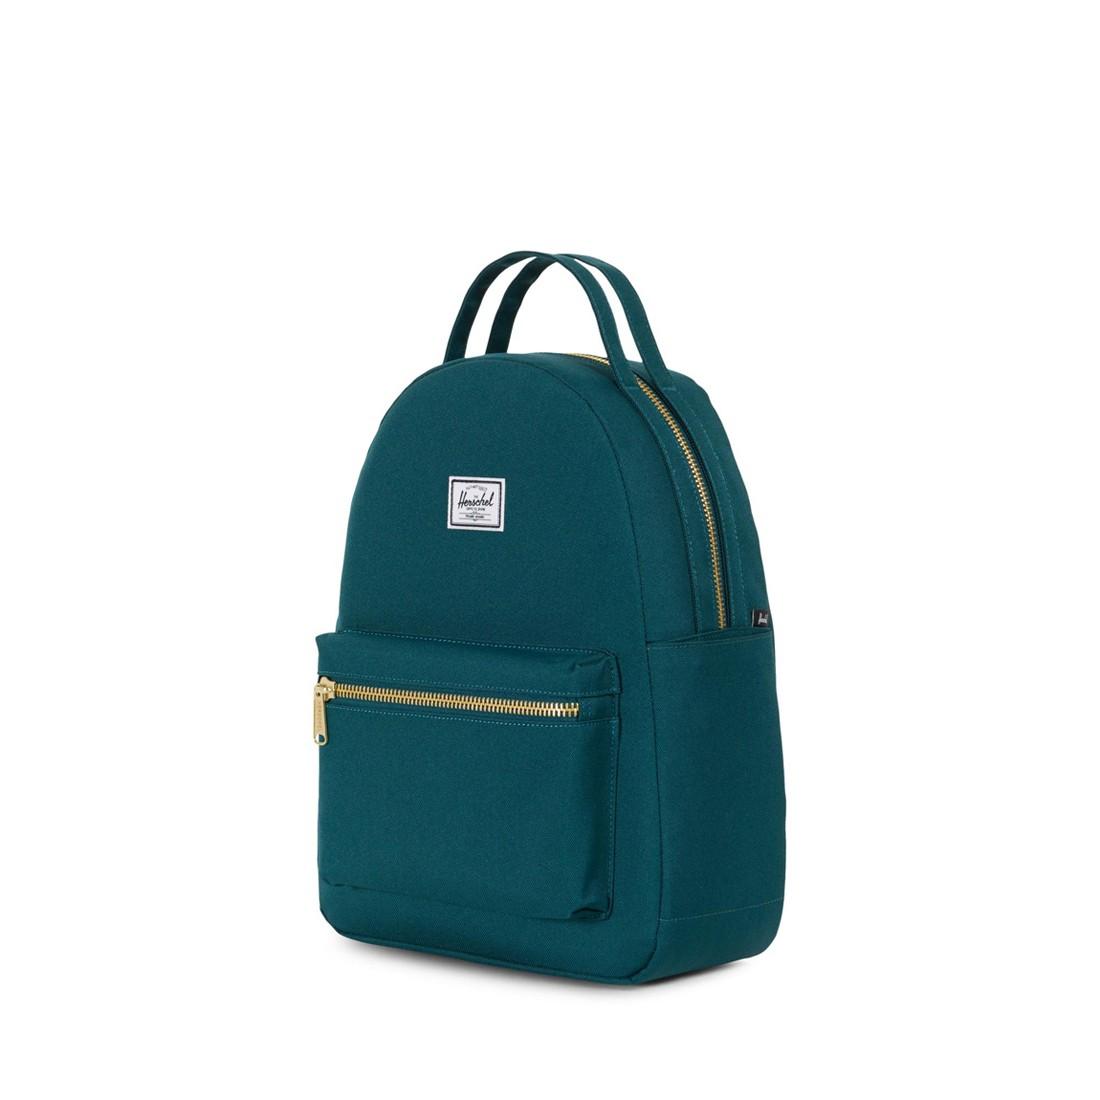 eb3df4d2414 Nova Backpack XS Deep Teal